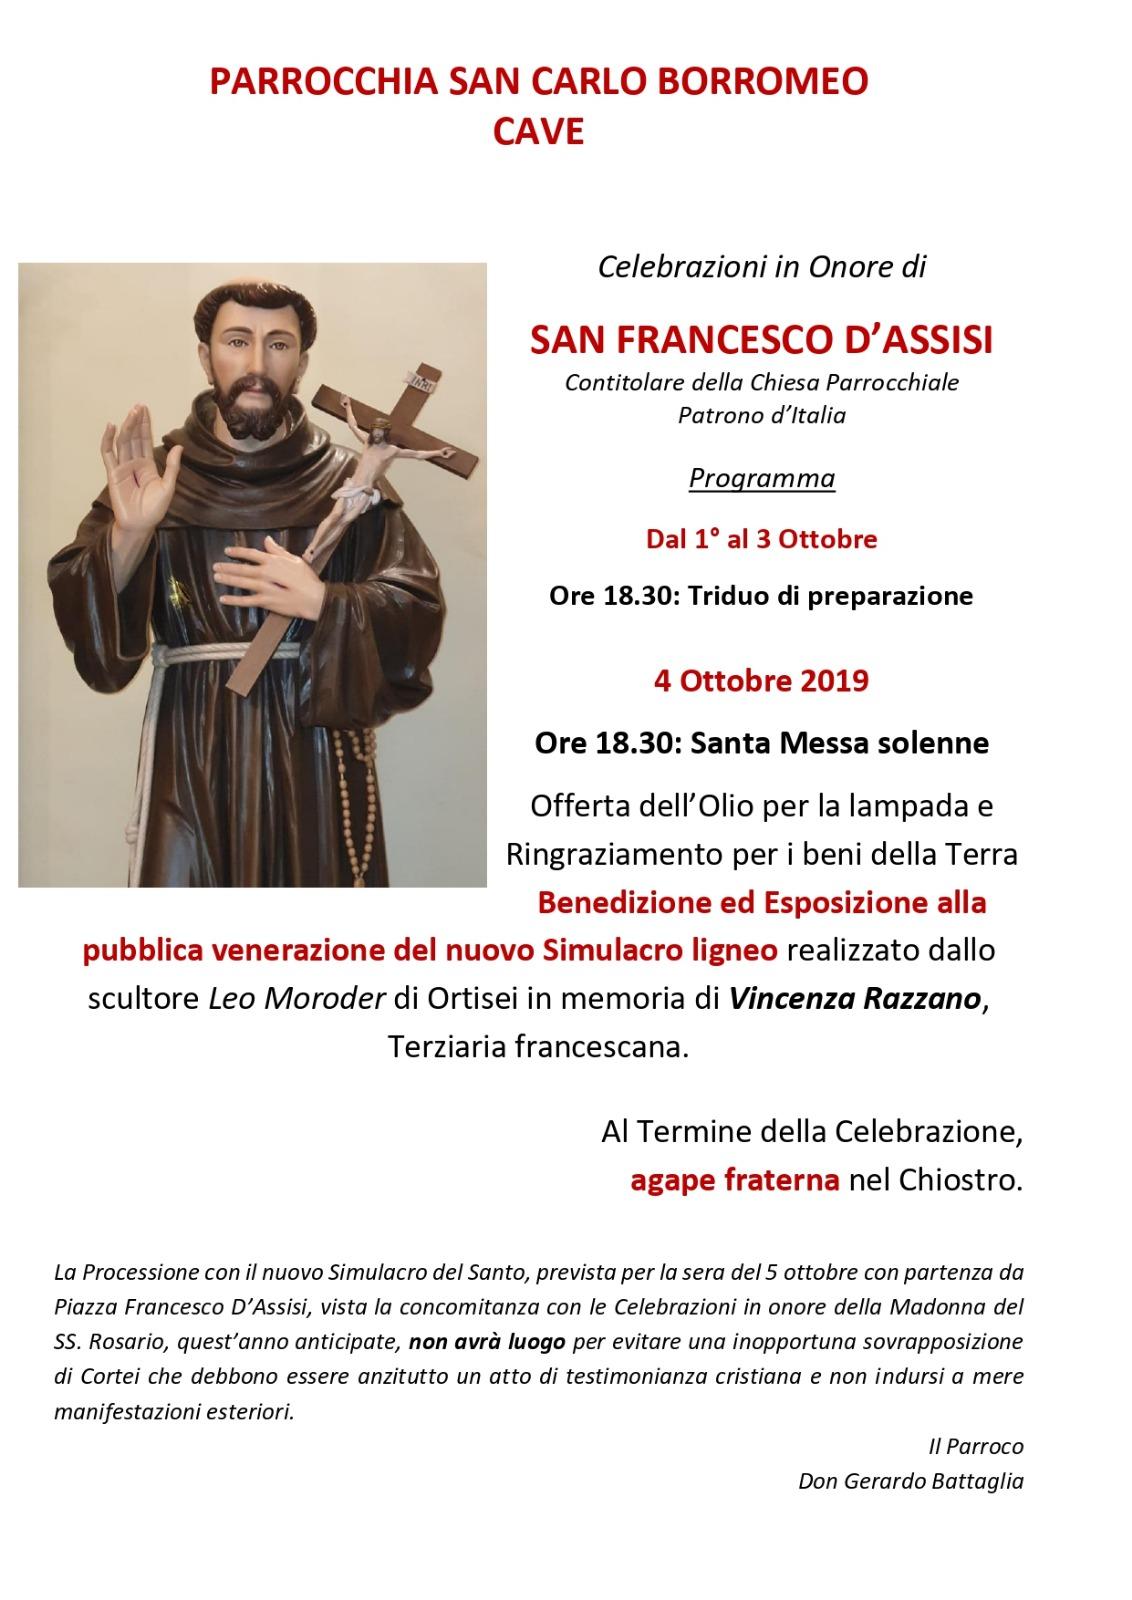 Celebrazioni San Francesco d'Assisi 2019